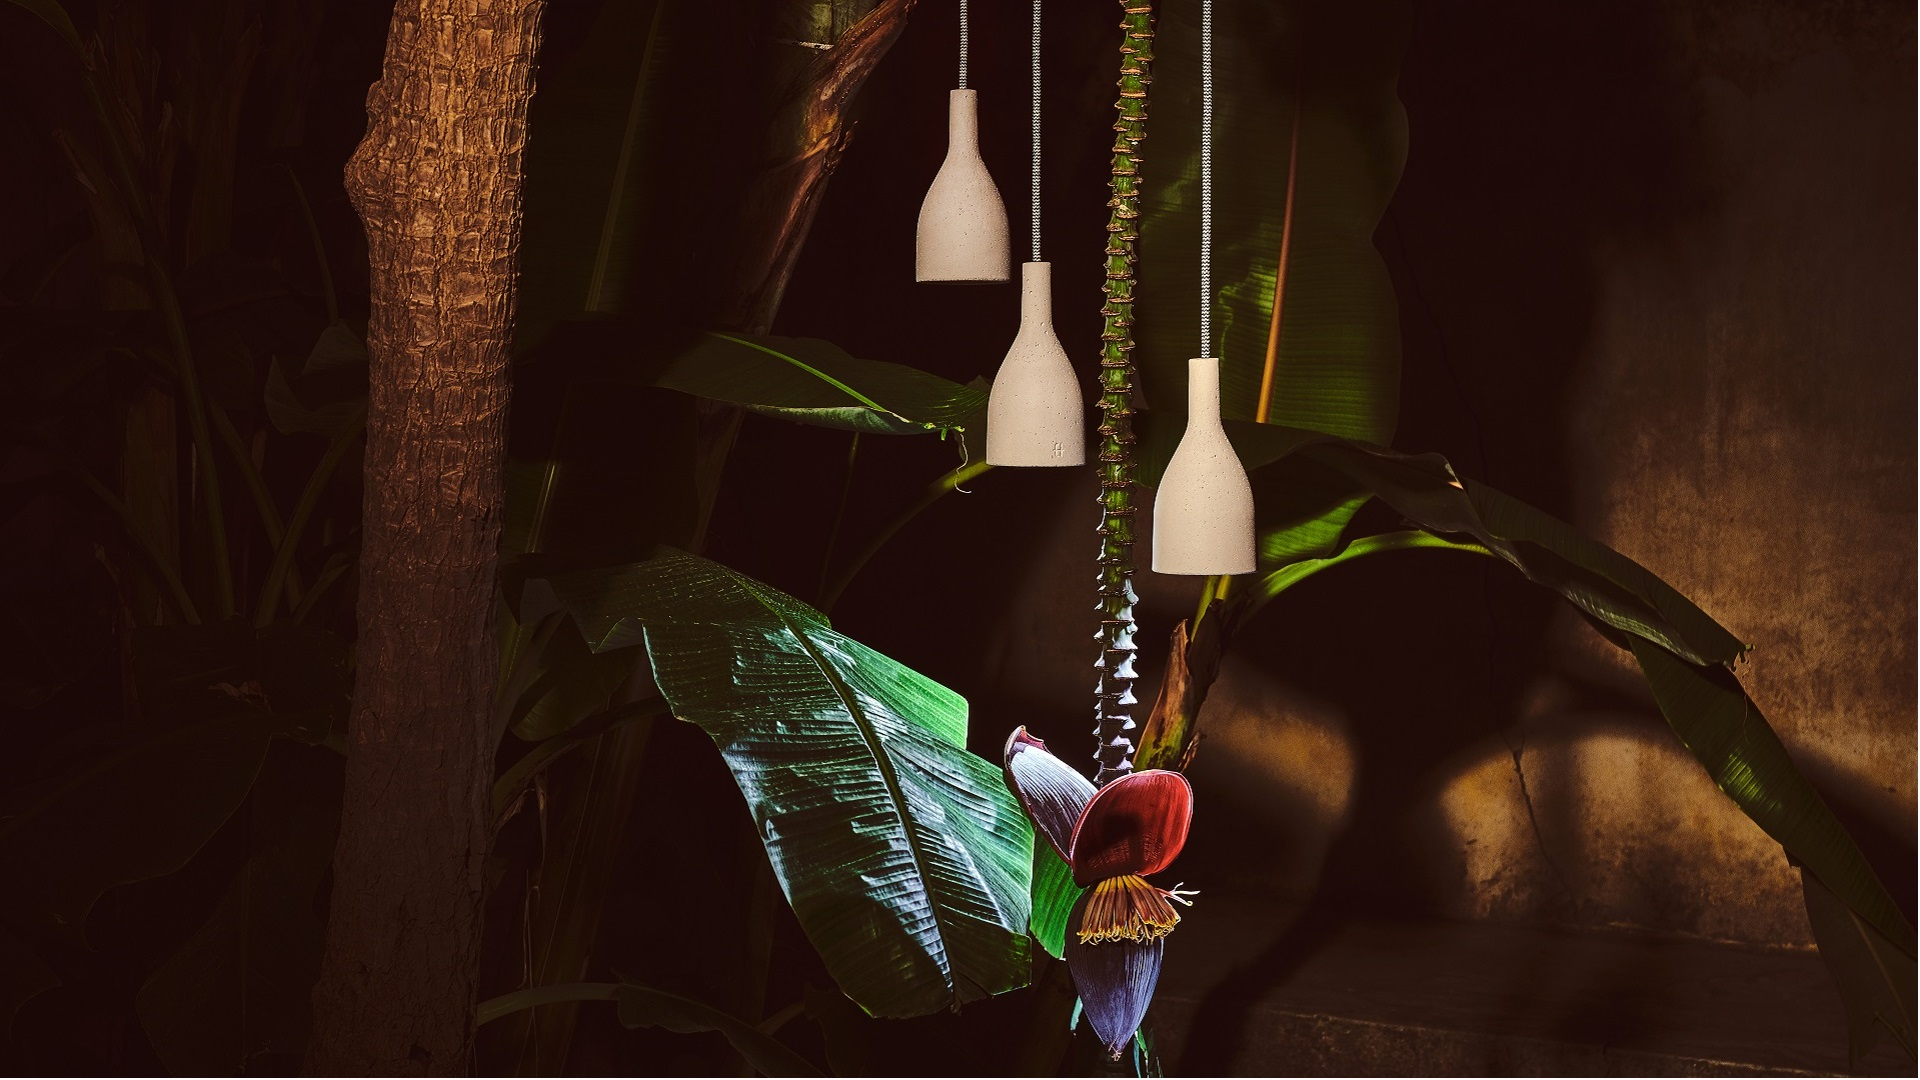 Ampulla_pendant_lamp_banner_urbi_et_orbi-1